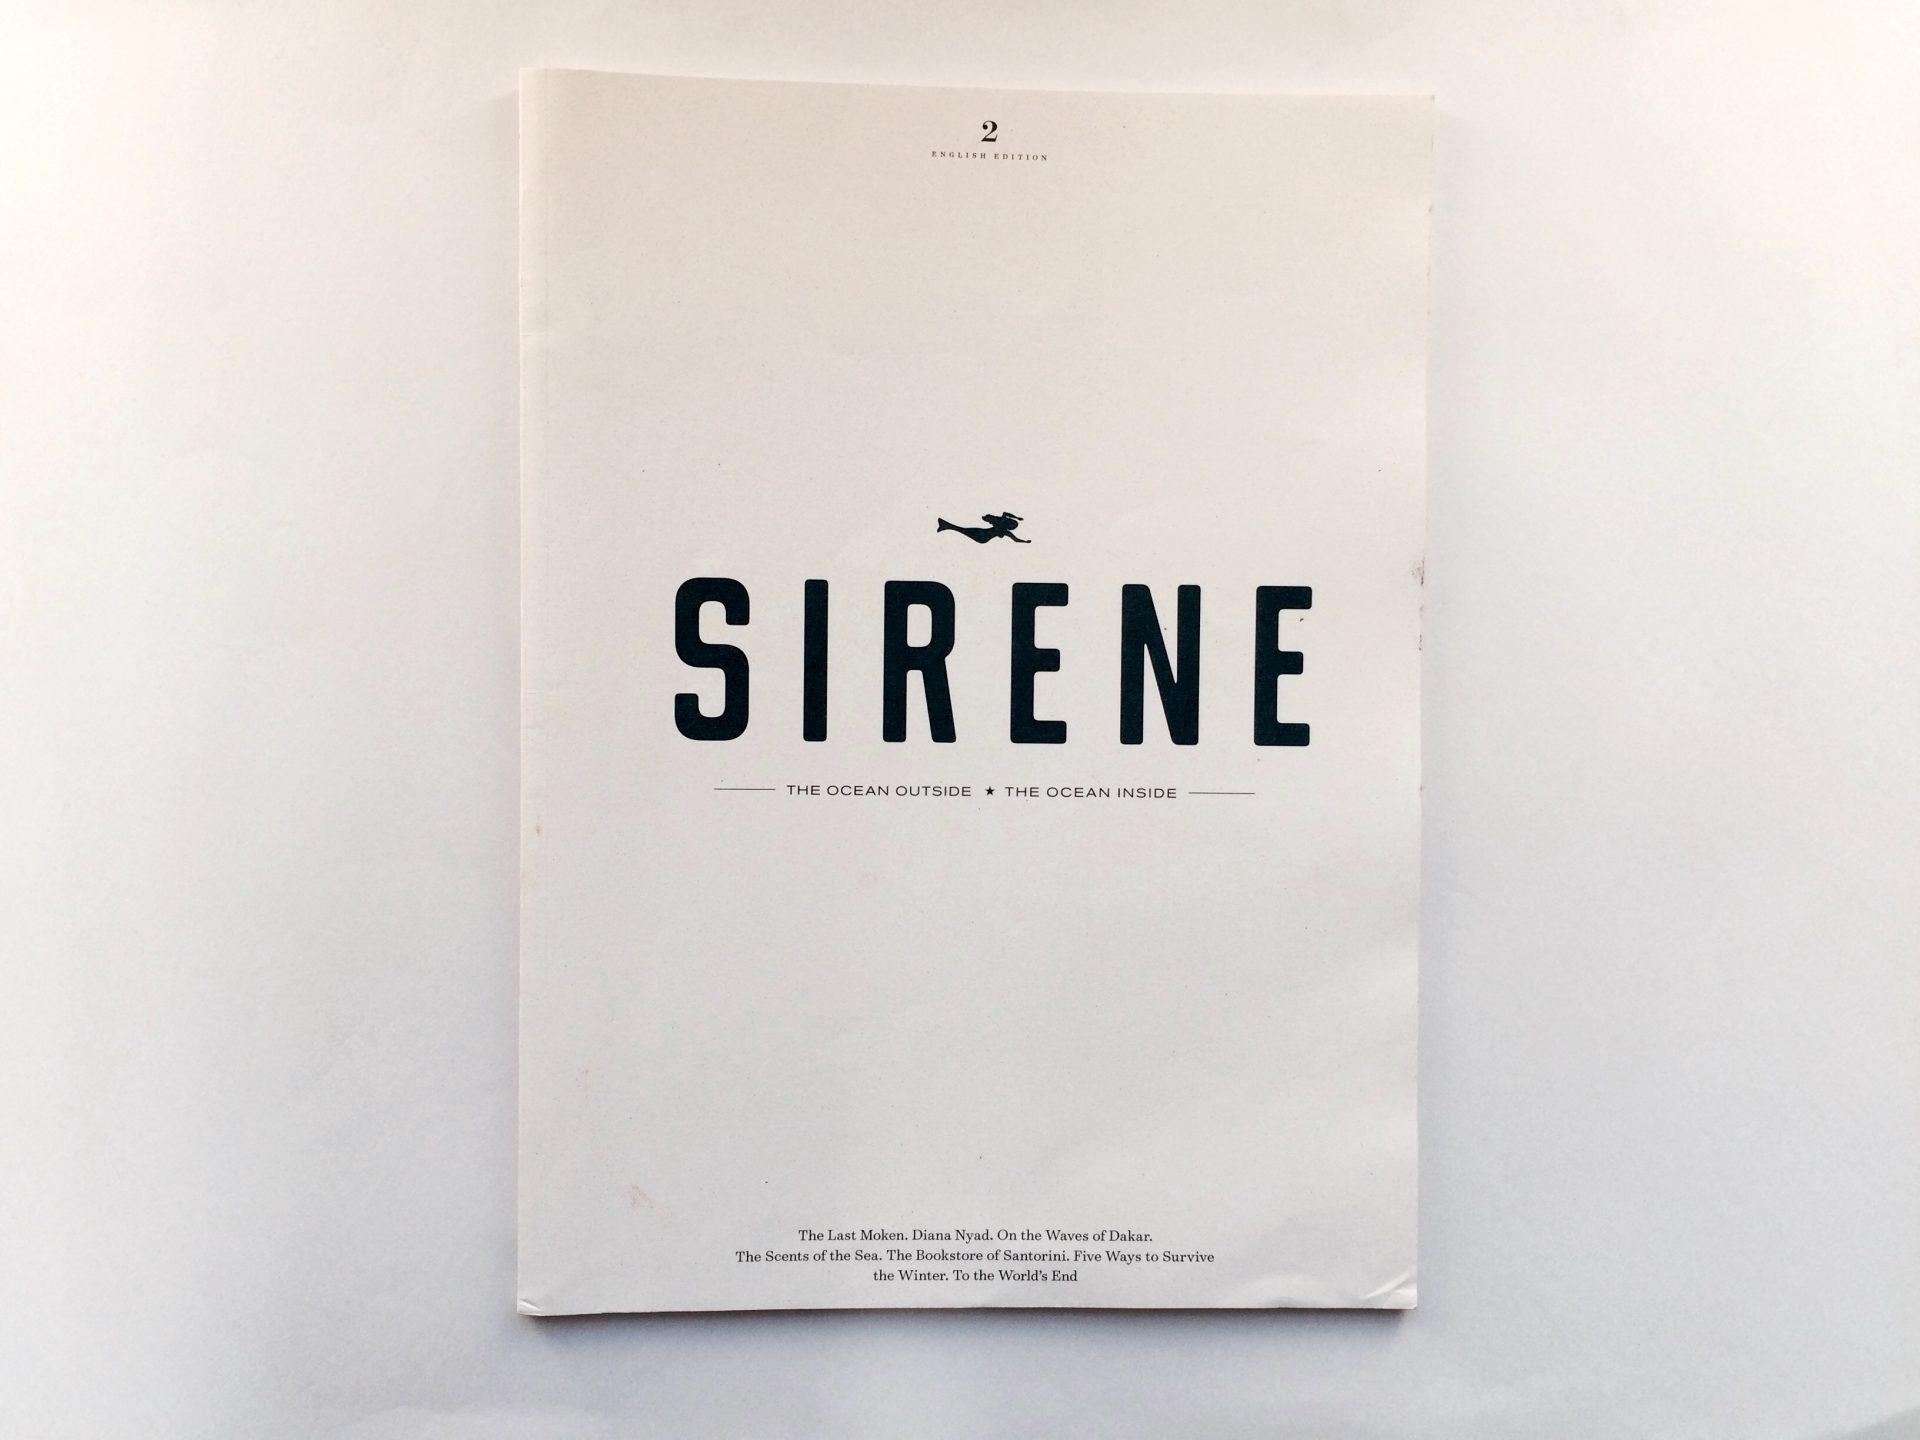 Sirene nº 2